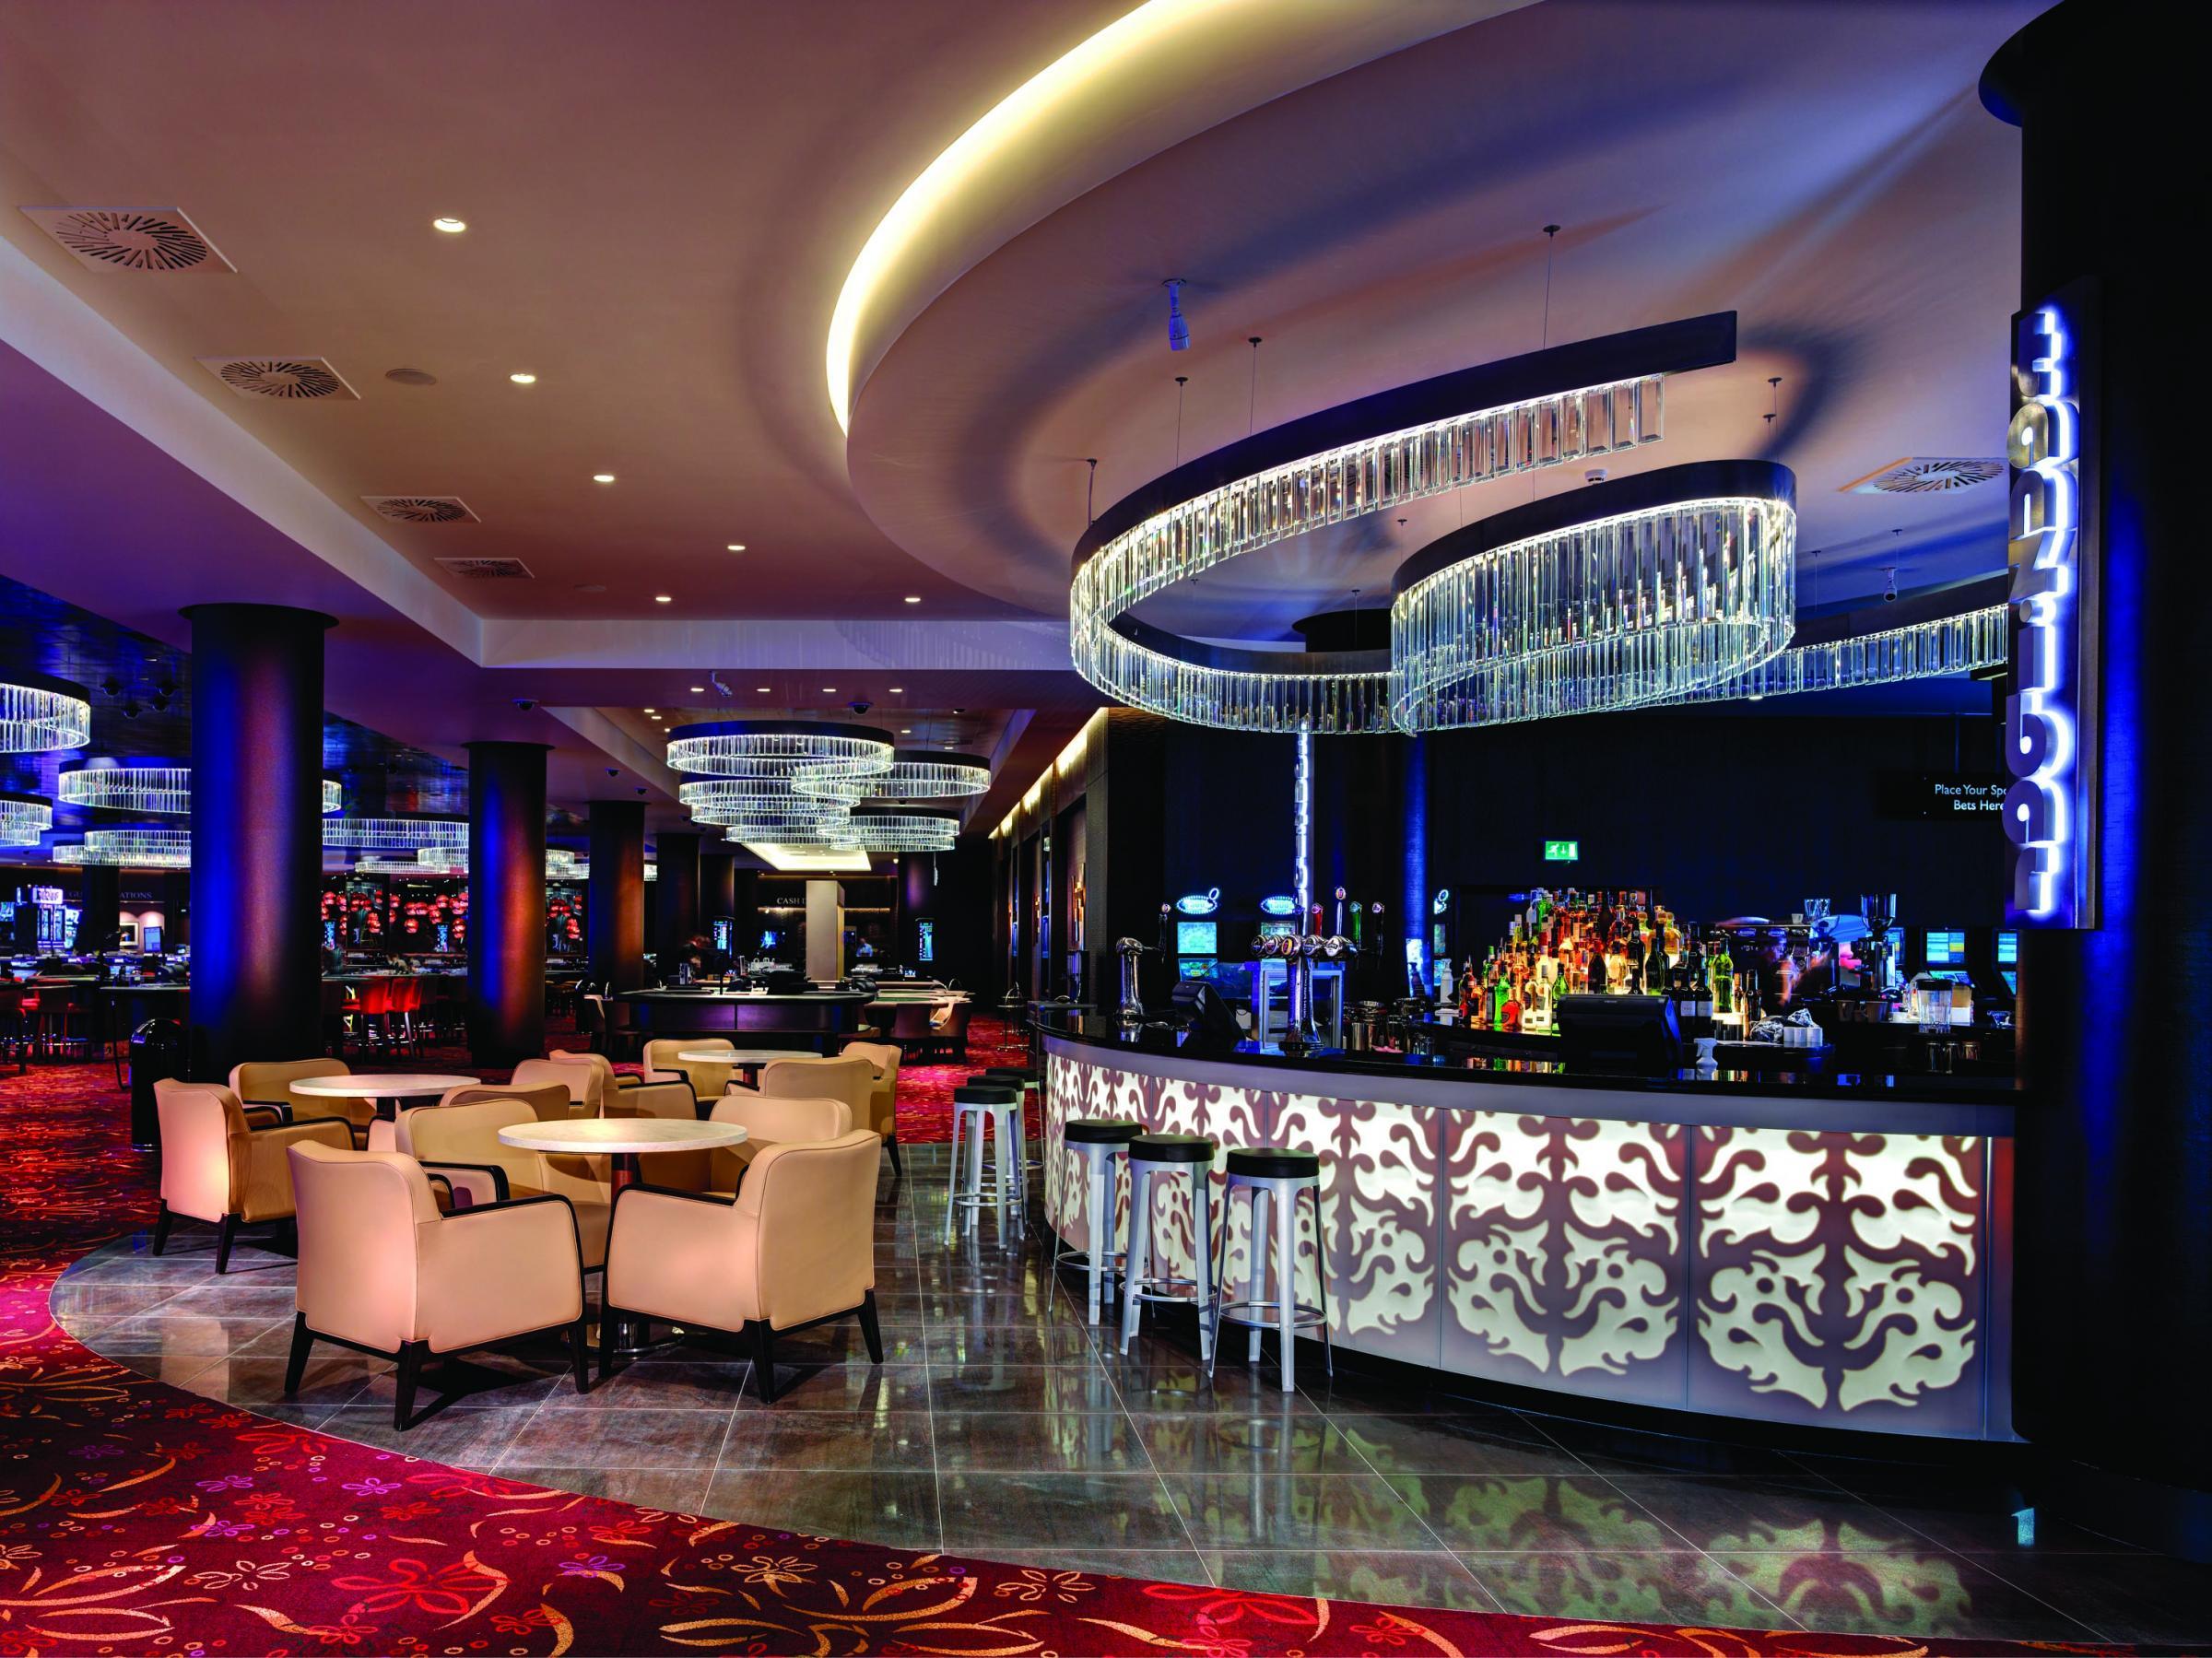 Milton wa casino casino in moncton news